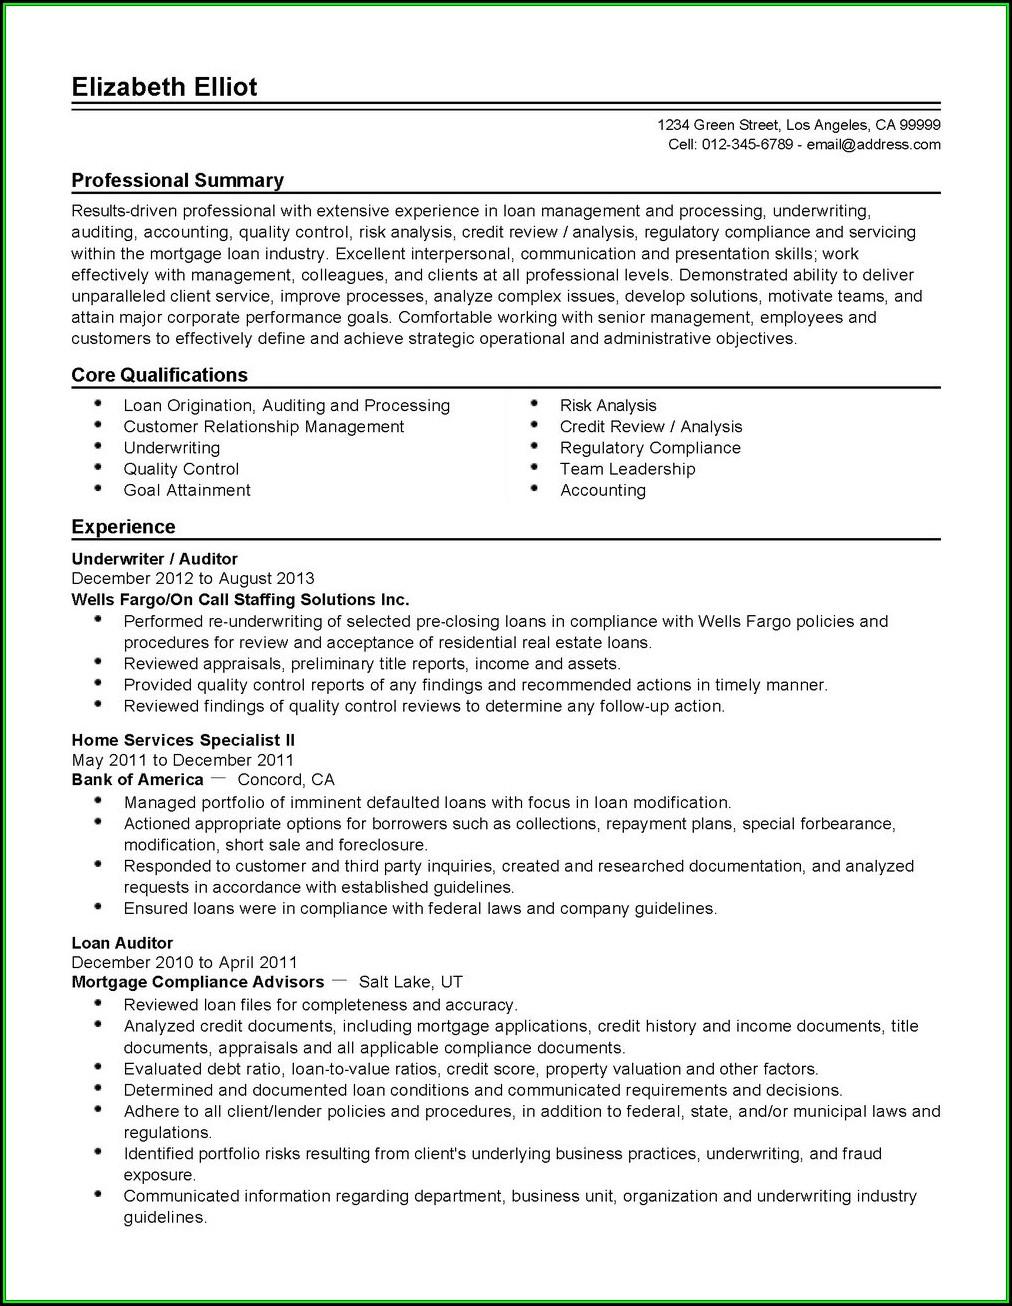 Professional Resume Writing Service Atlanta Ga